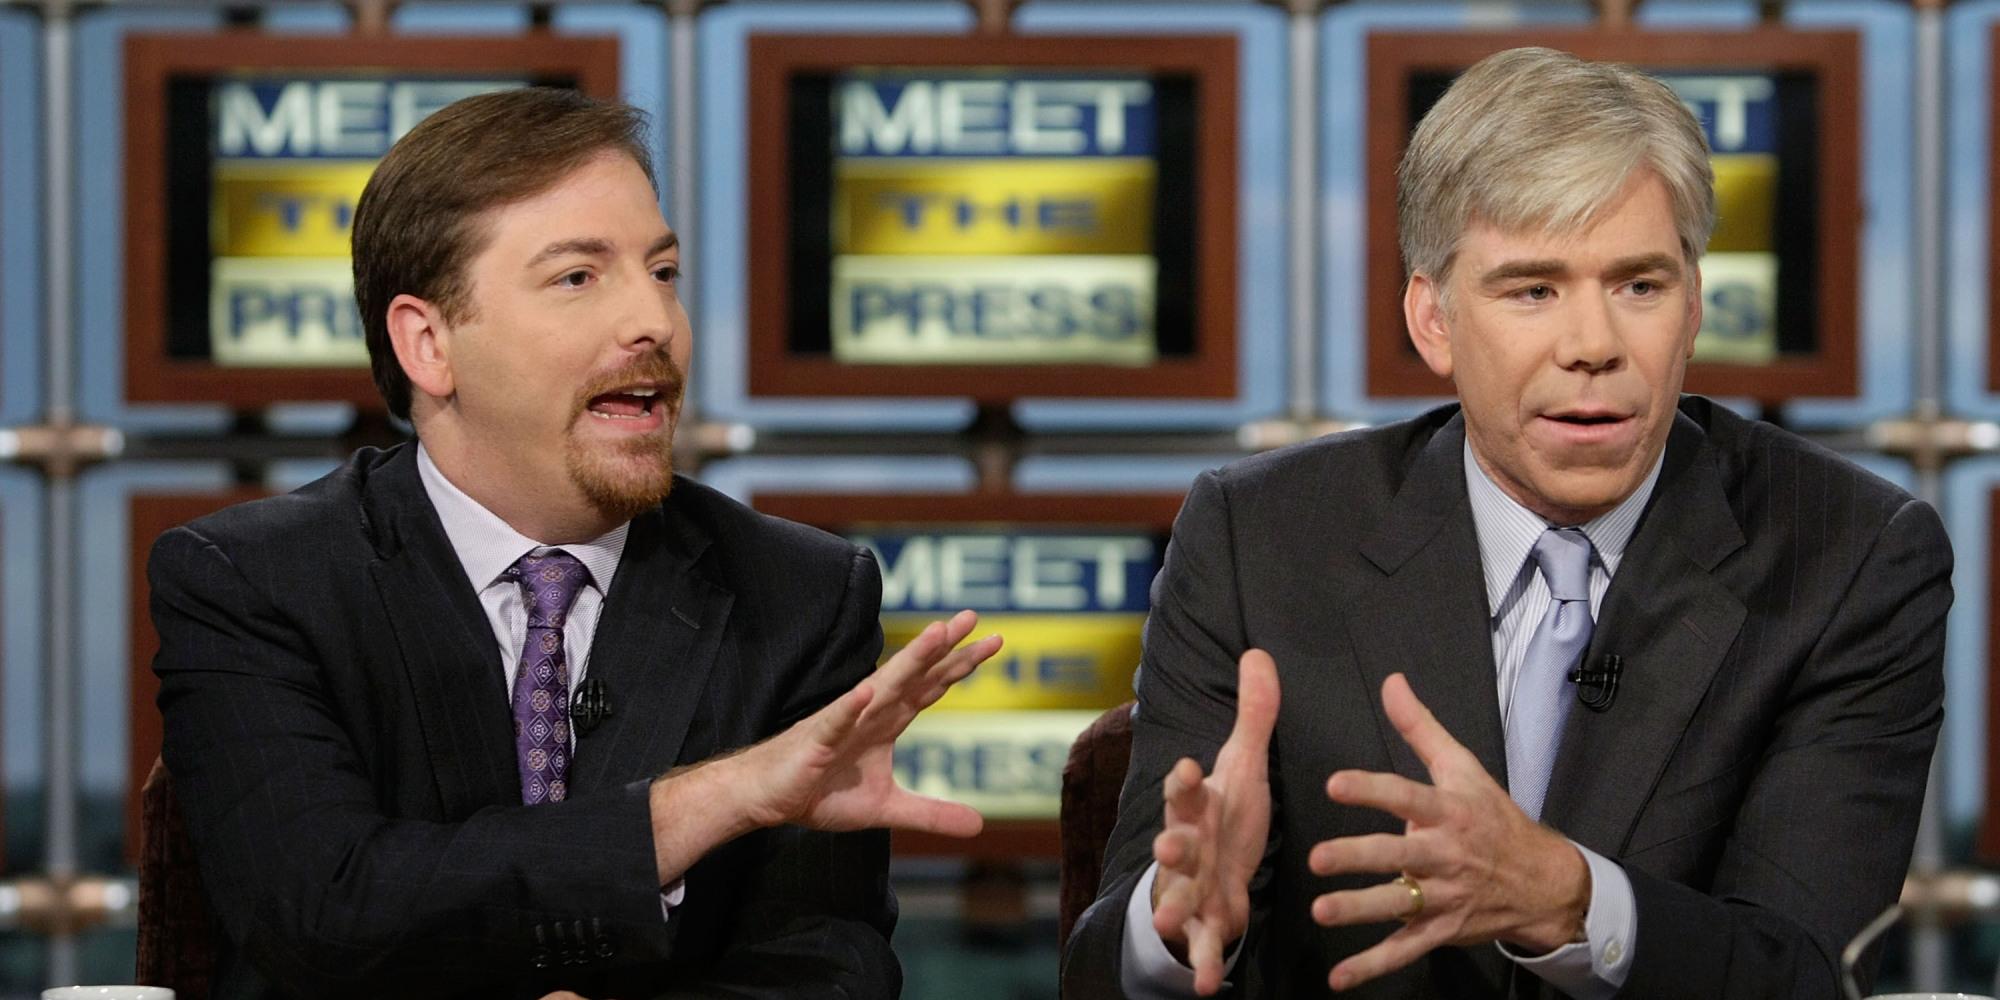 meet the press chuck todd ratings decline